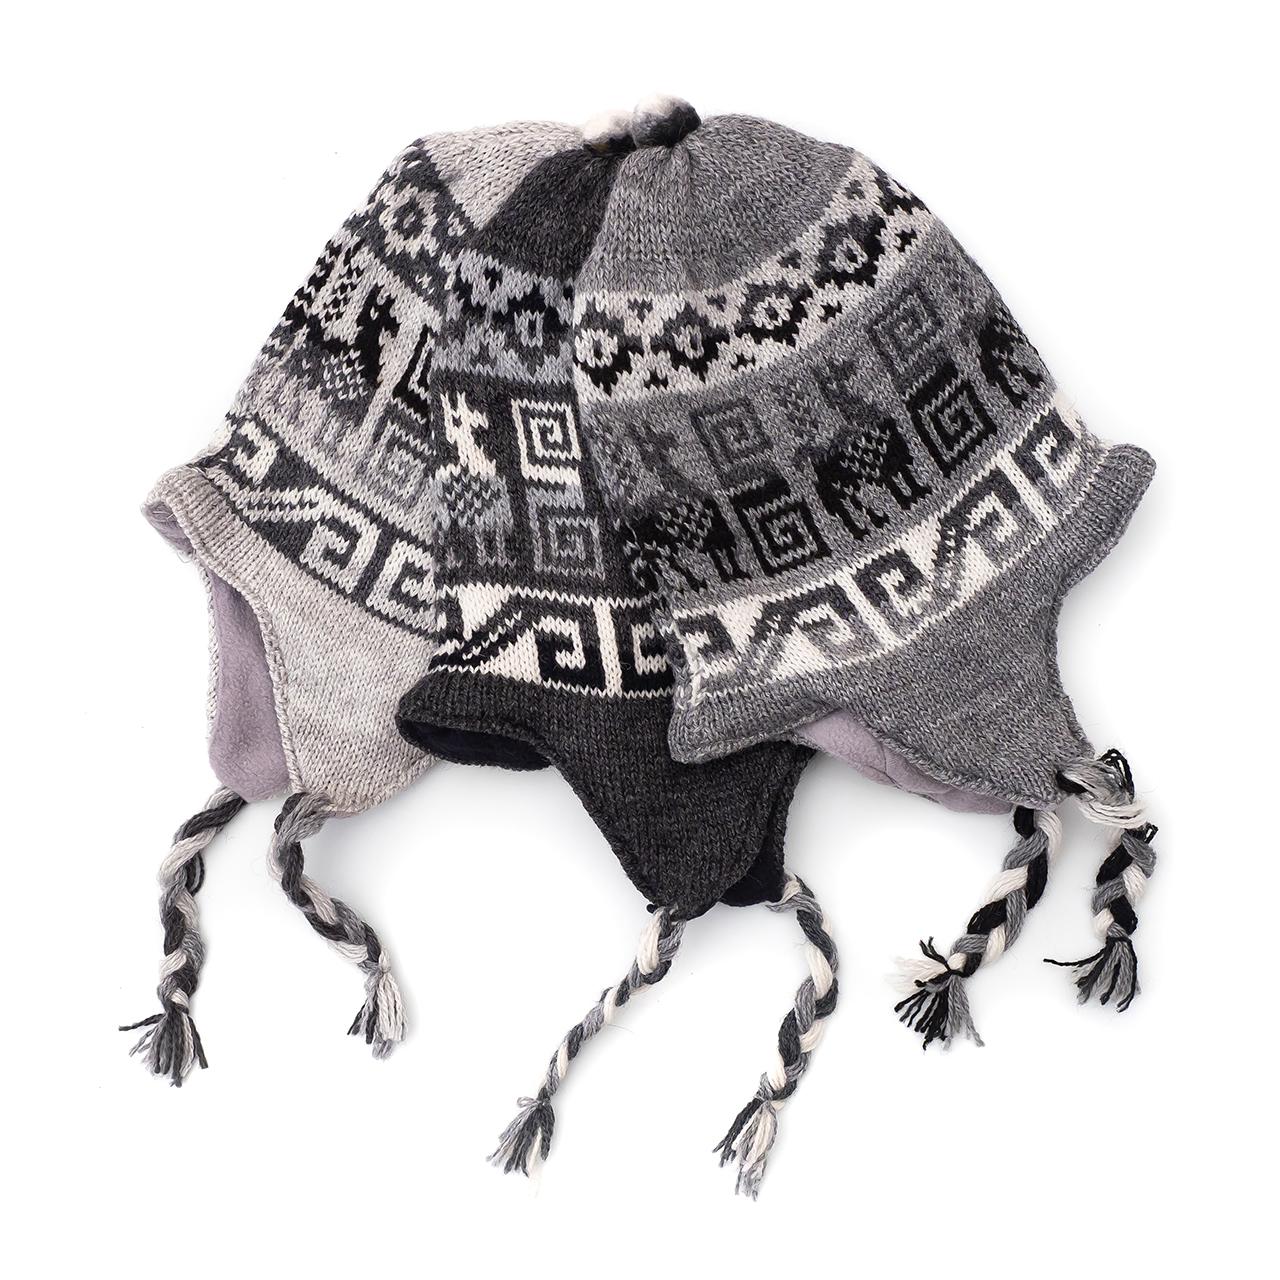 снимка на Зимна шапка Chullo в сивата гама.